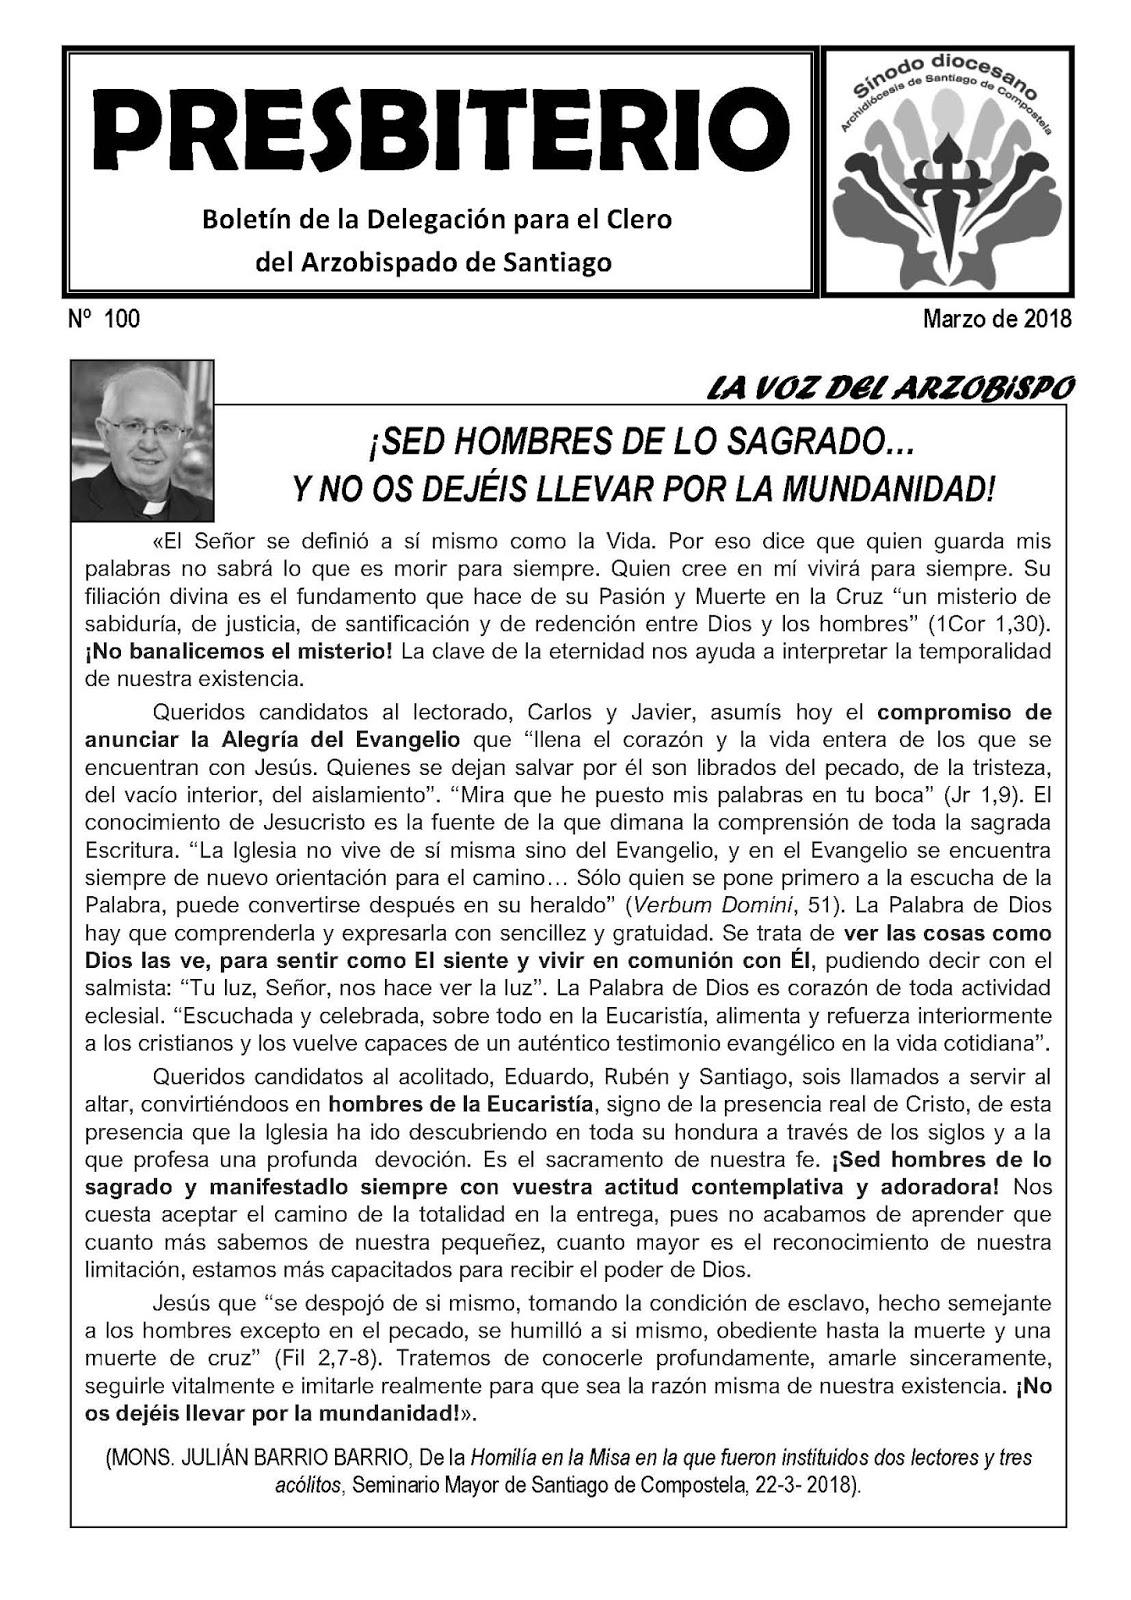 https://www.dropbox.com/s/8q11xnsafuankft/Presbiterio_100.pdf?dl=0